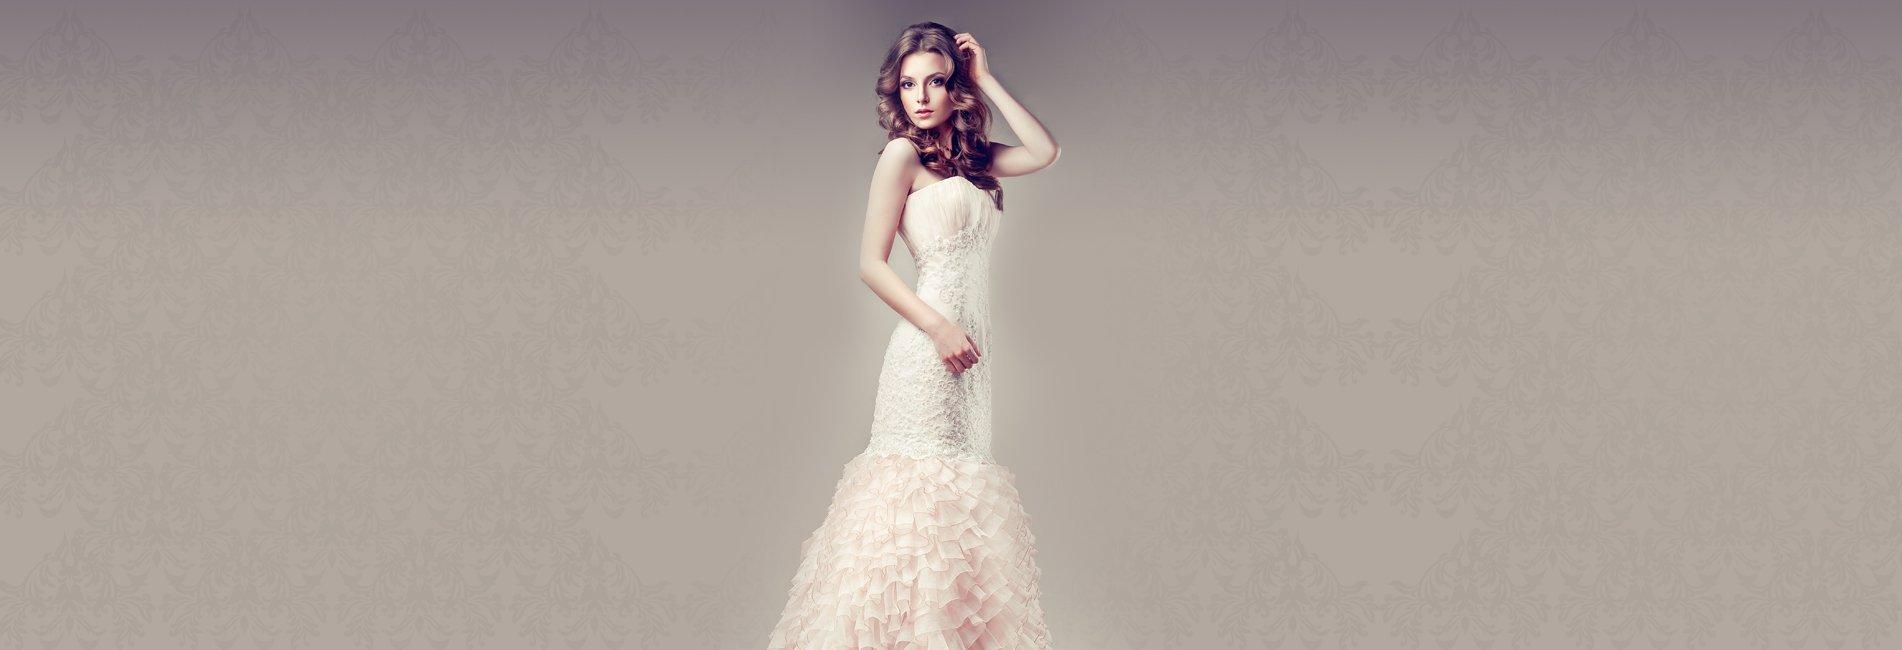 Wedding dress alterations | Esteem